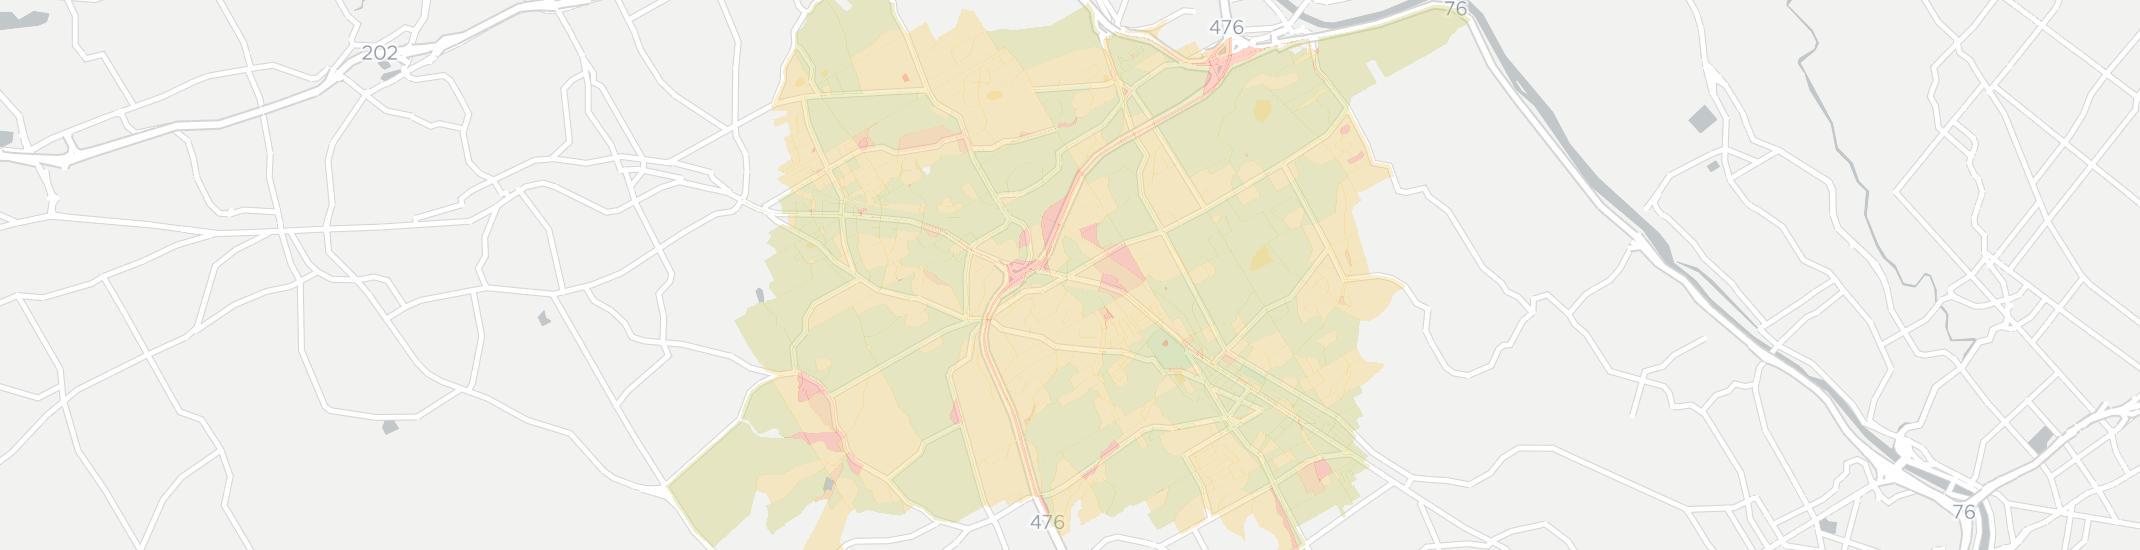 Villanova Internet Competition Map. Click for interactive map.